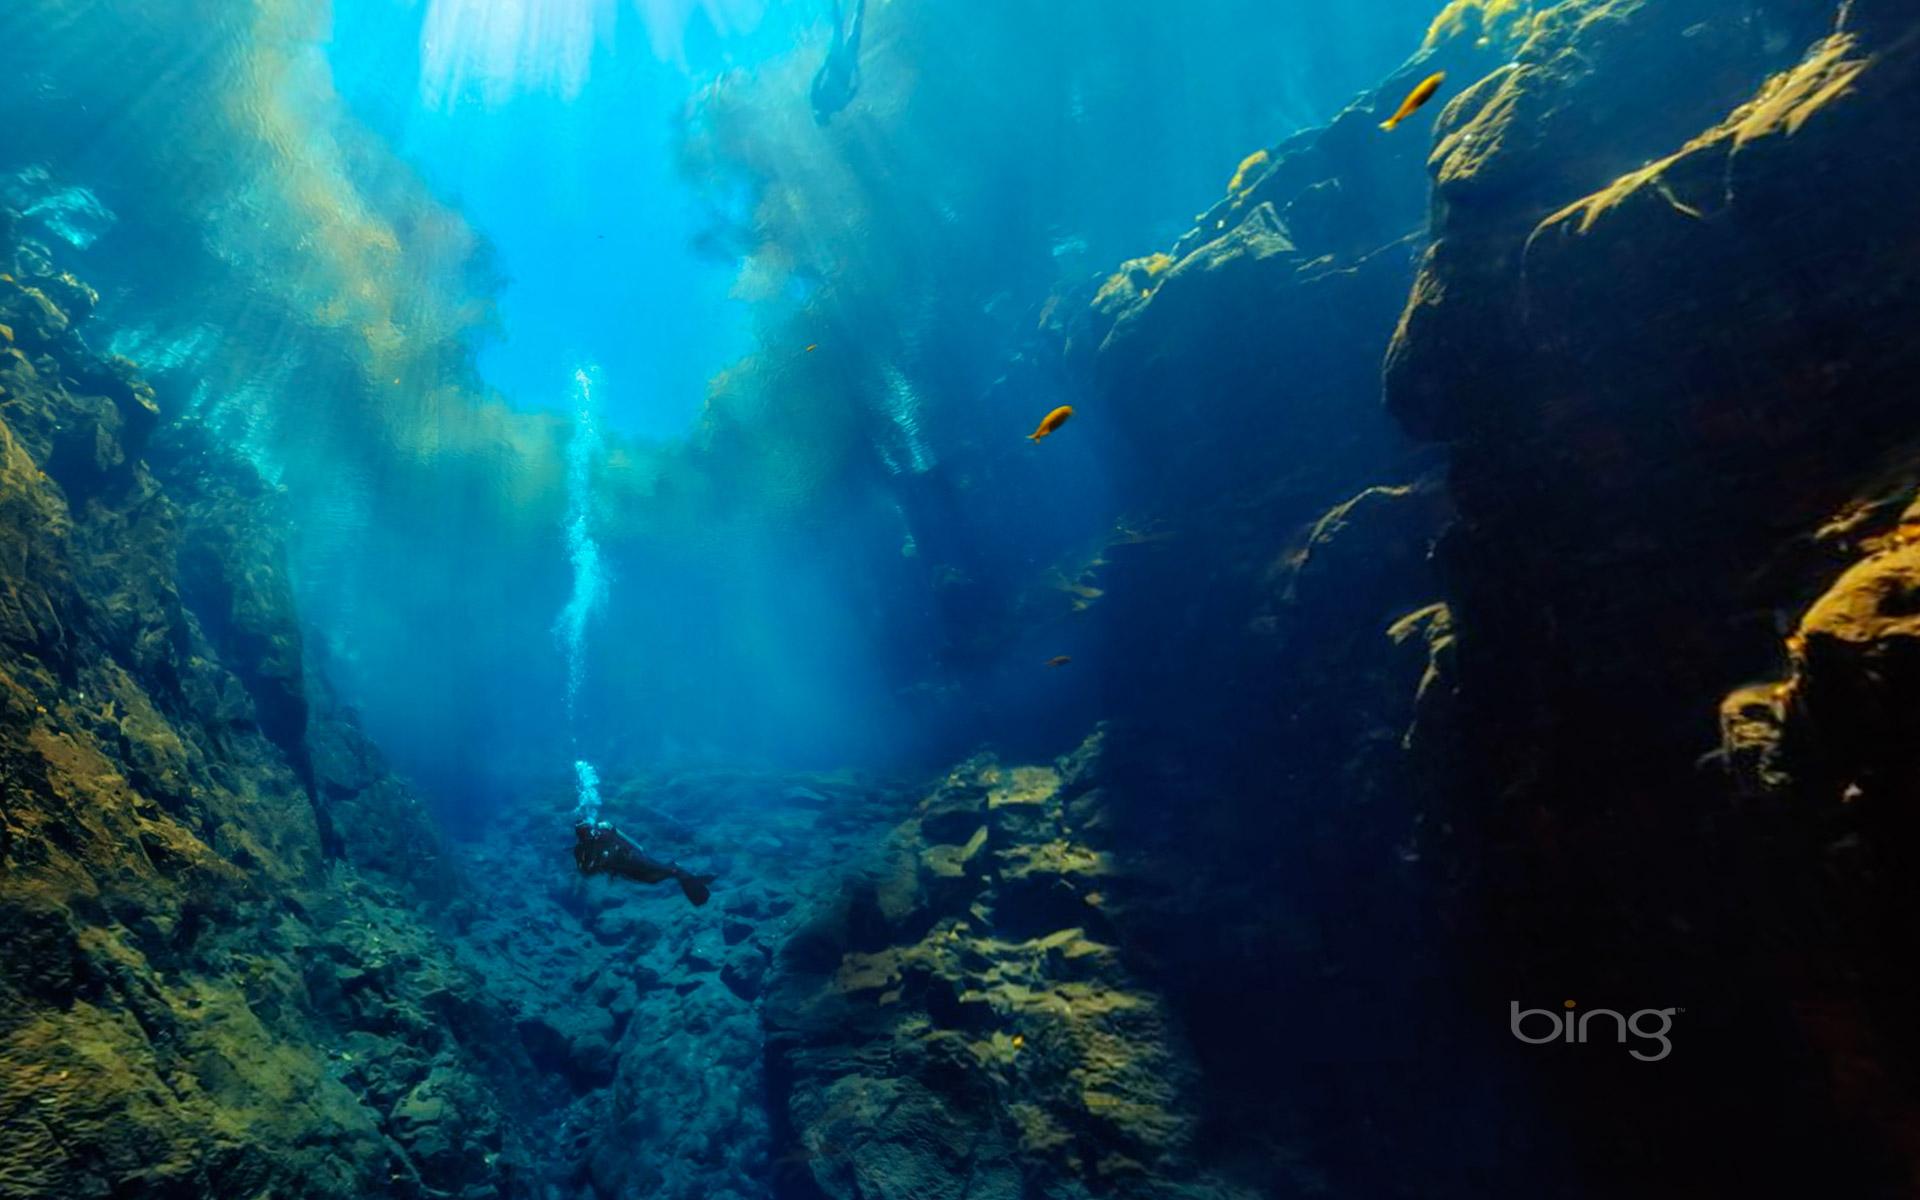 Underwater view of Lagoa Misteriosa Mysterious Lagoon in Jardim 1920x1200